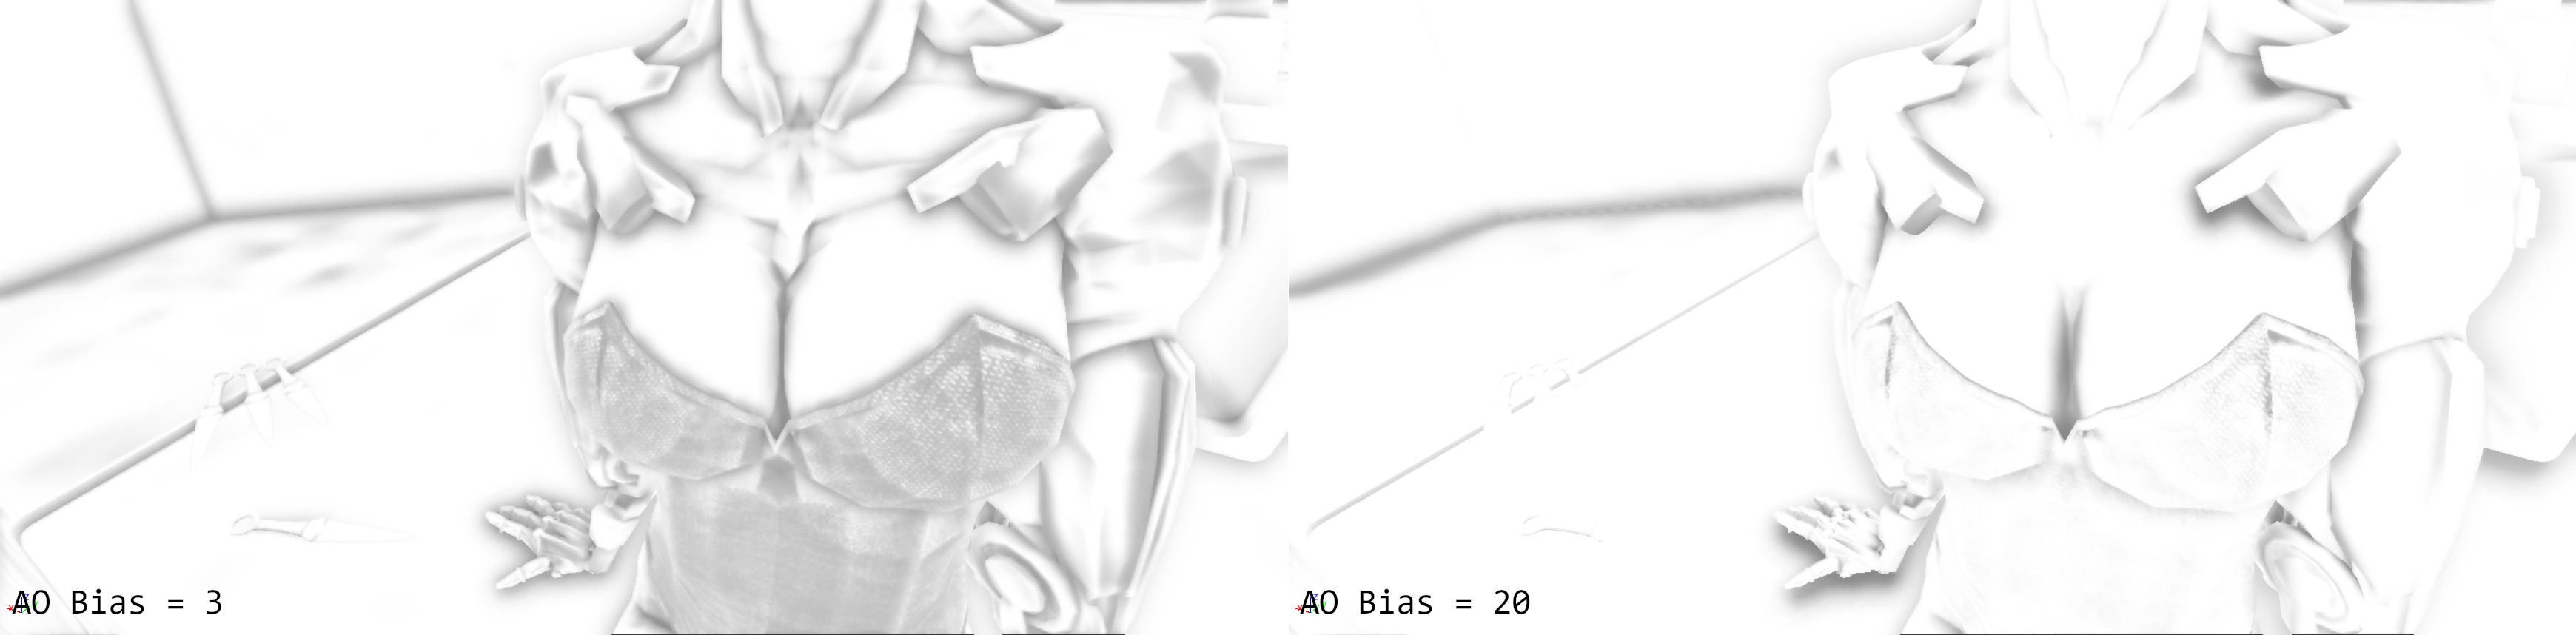 post-process AO bias value comparison